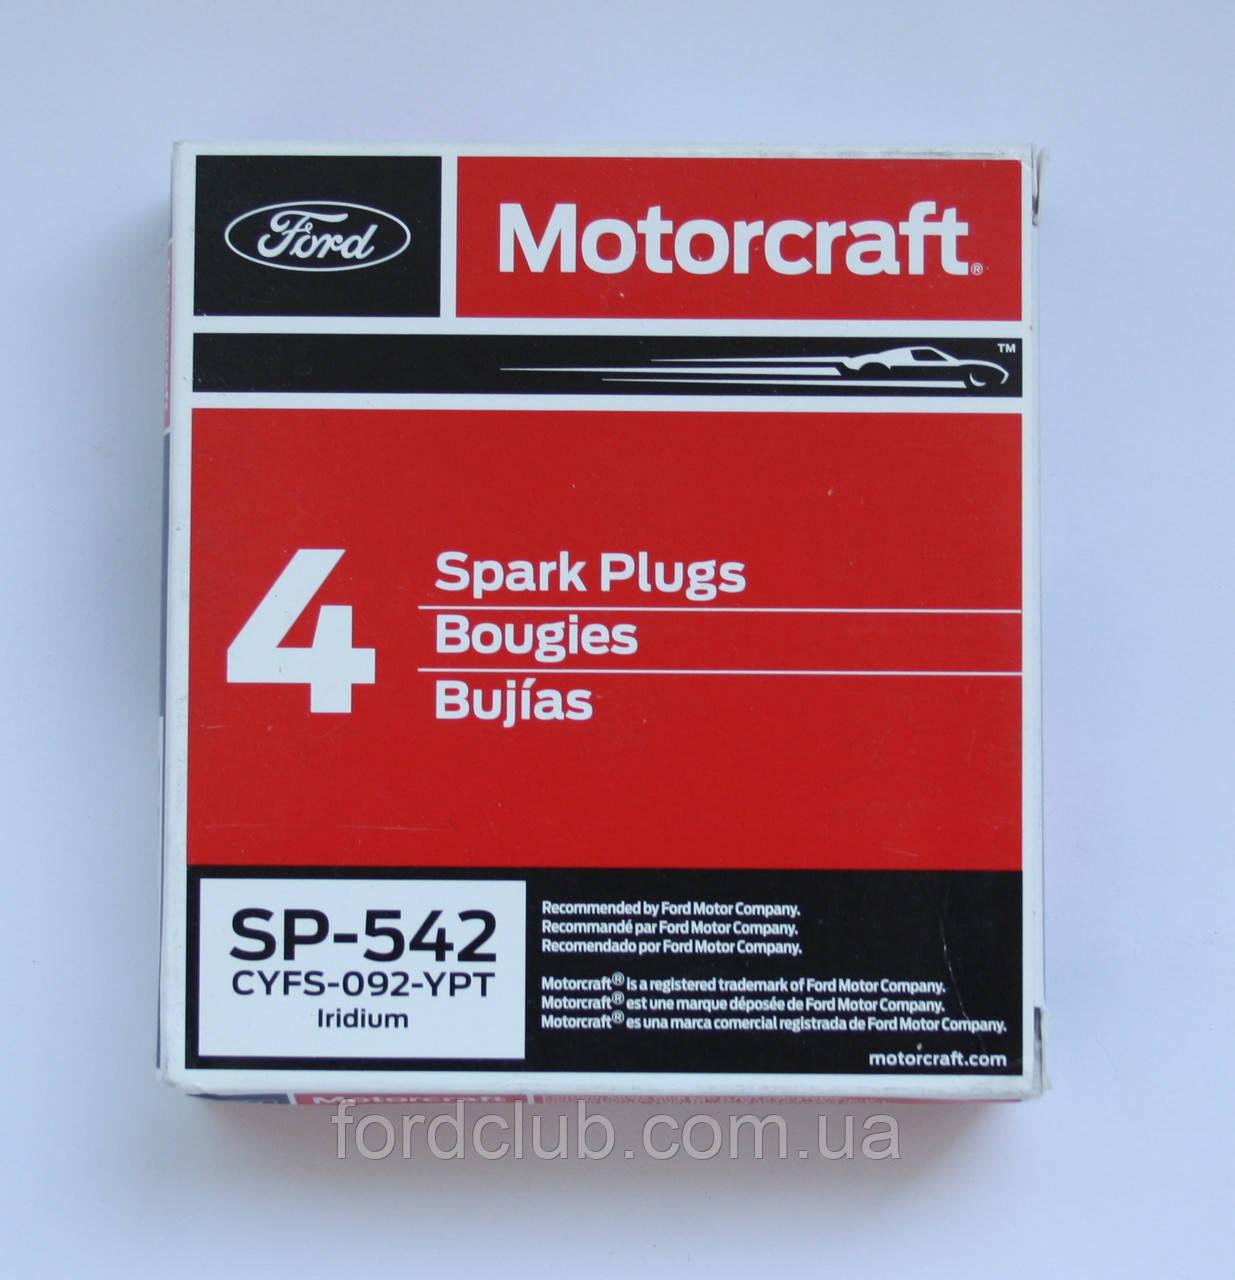 Свечи Ford Fusion USA 2.7; Motorcraft SP-542 6 шт